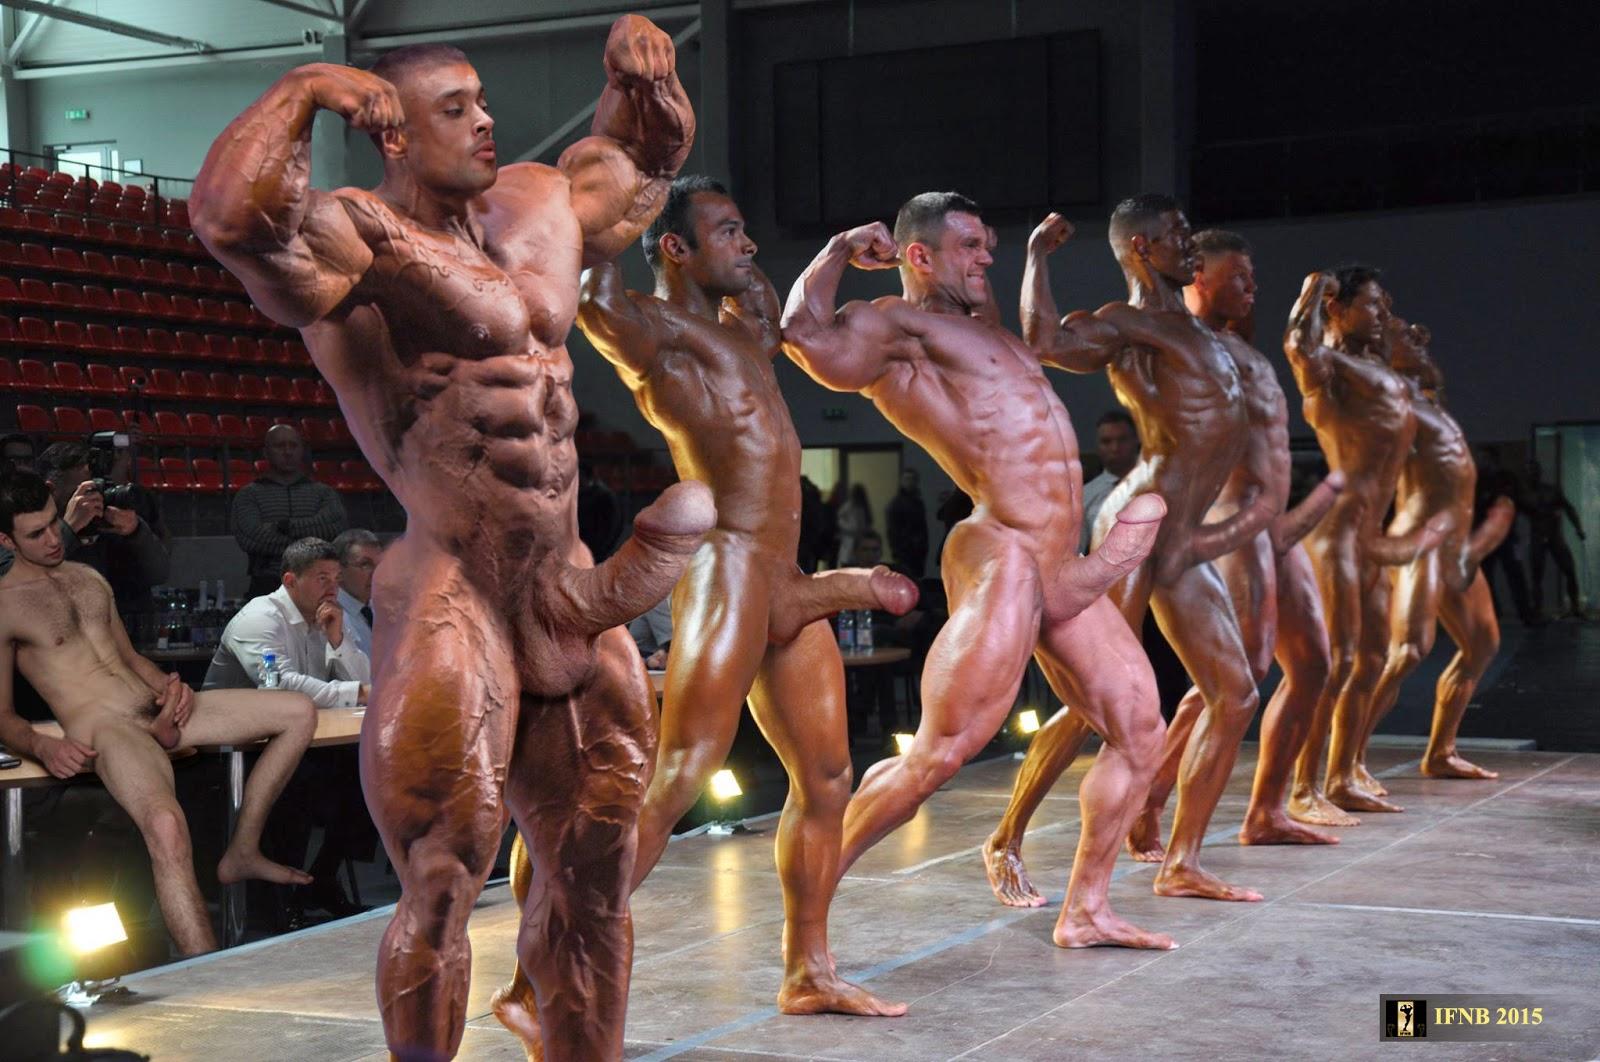 Best cock contest